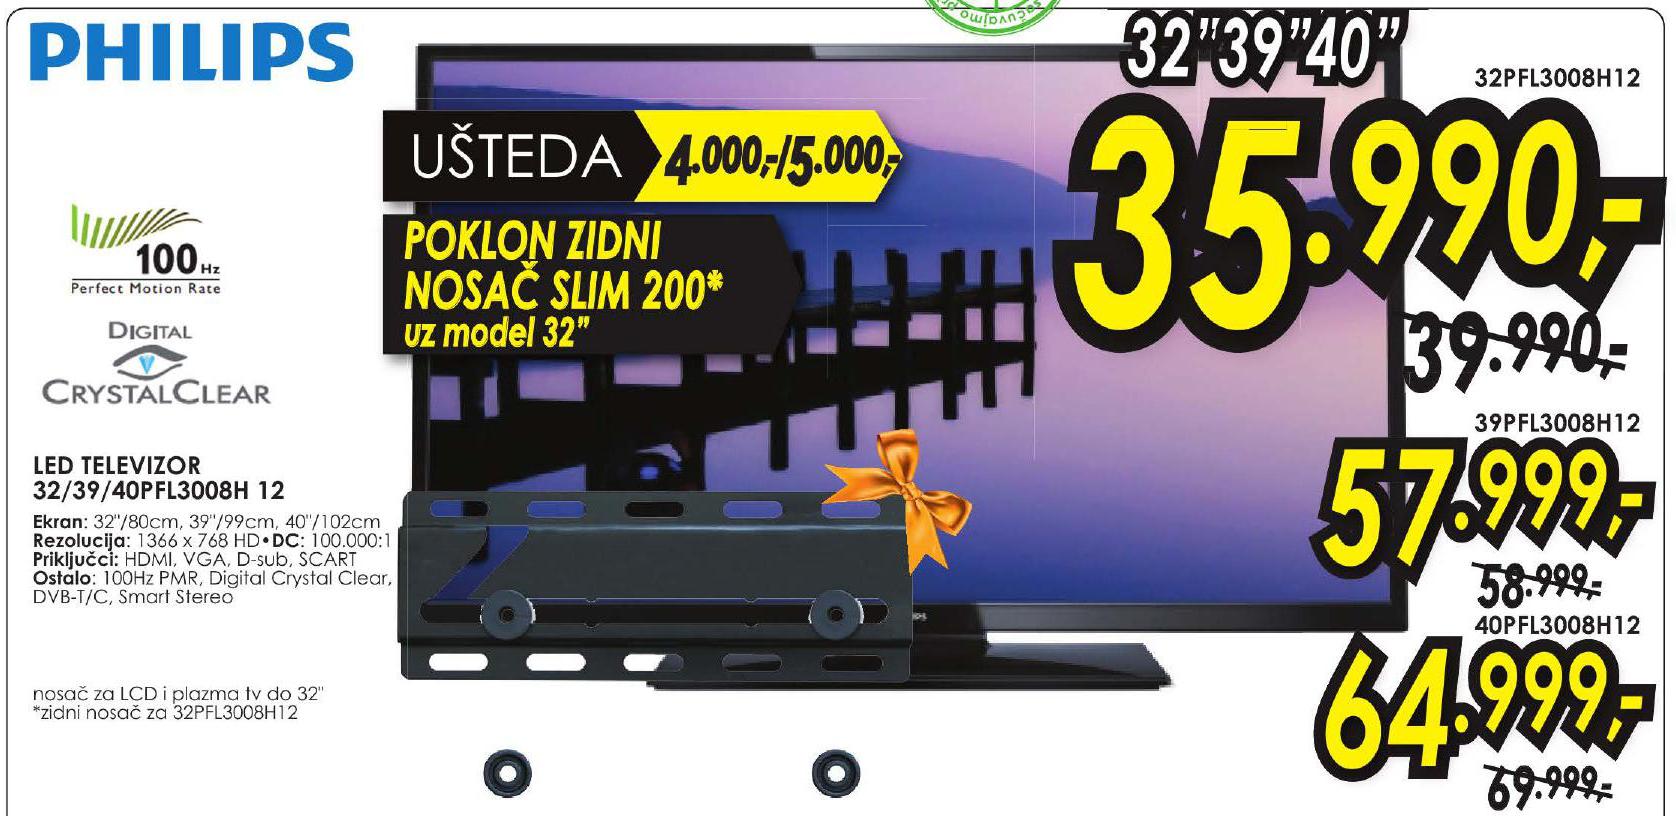 LED Televizor 39fl3008H 12